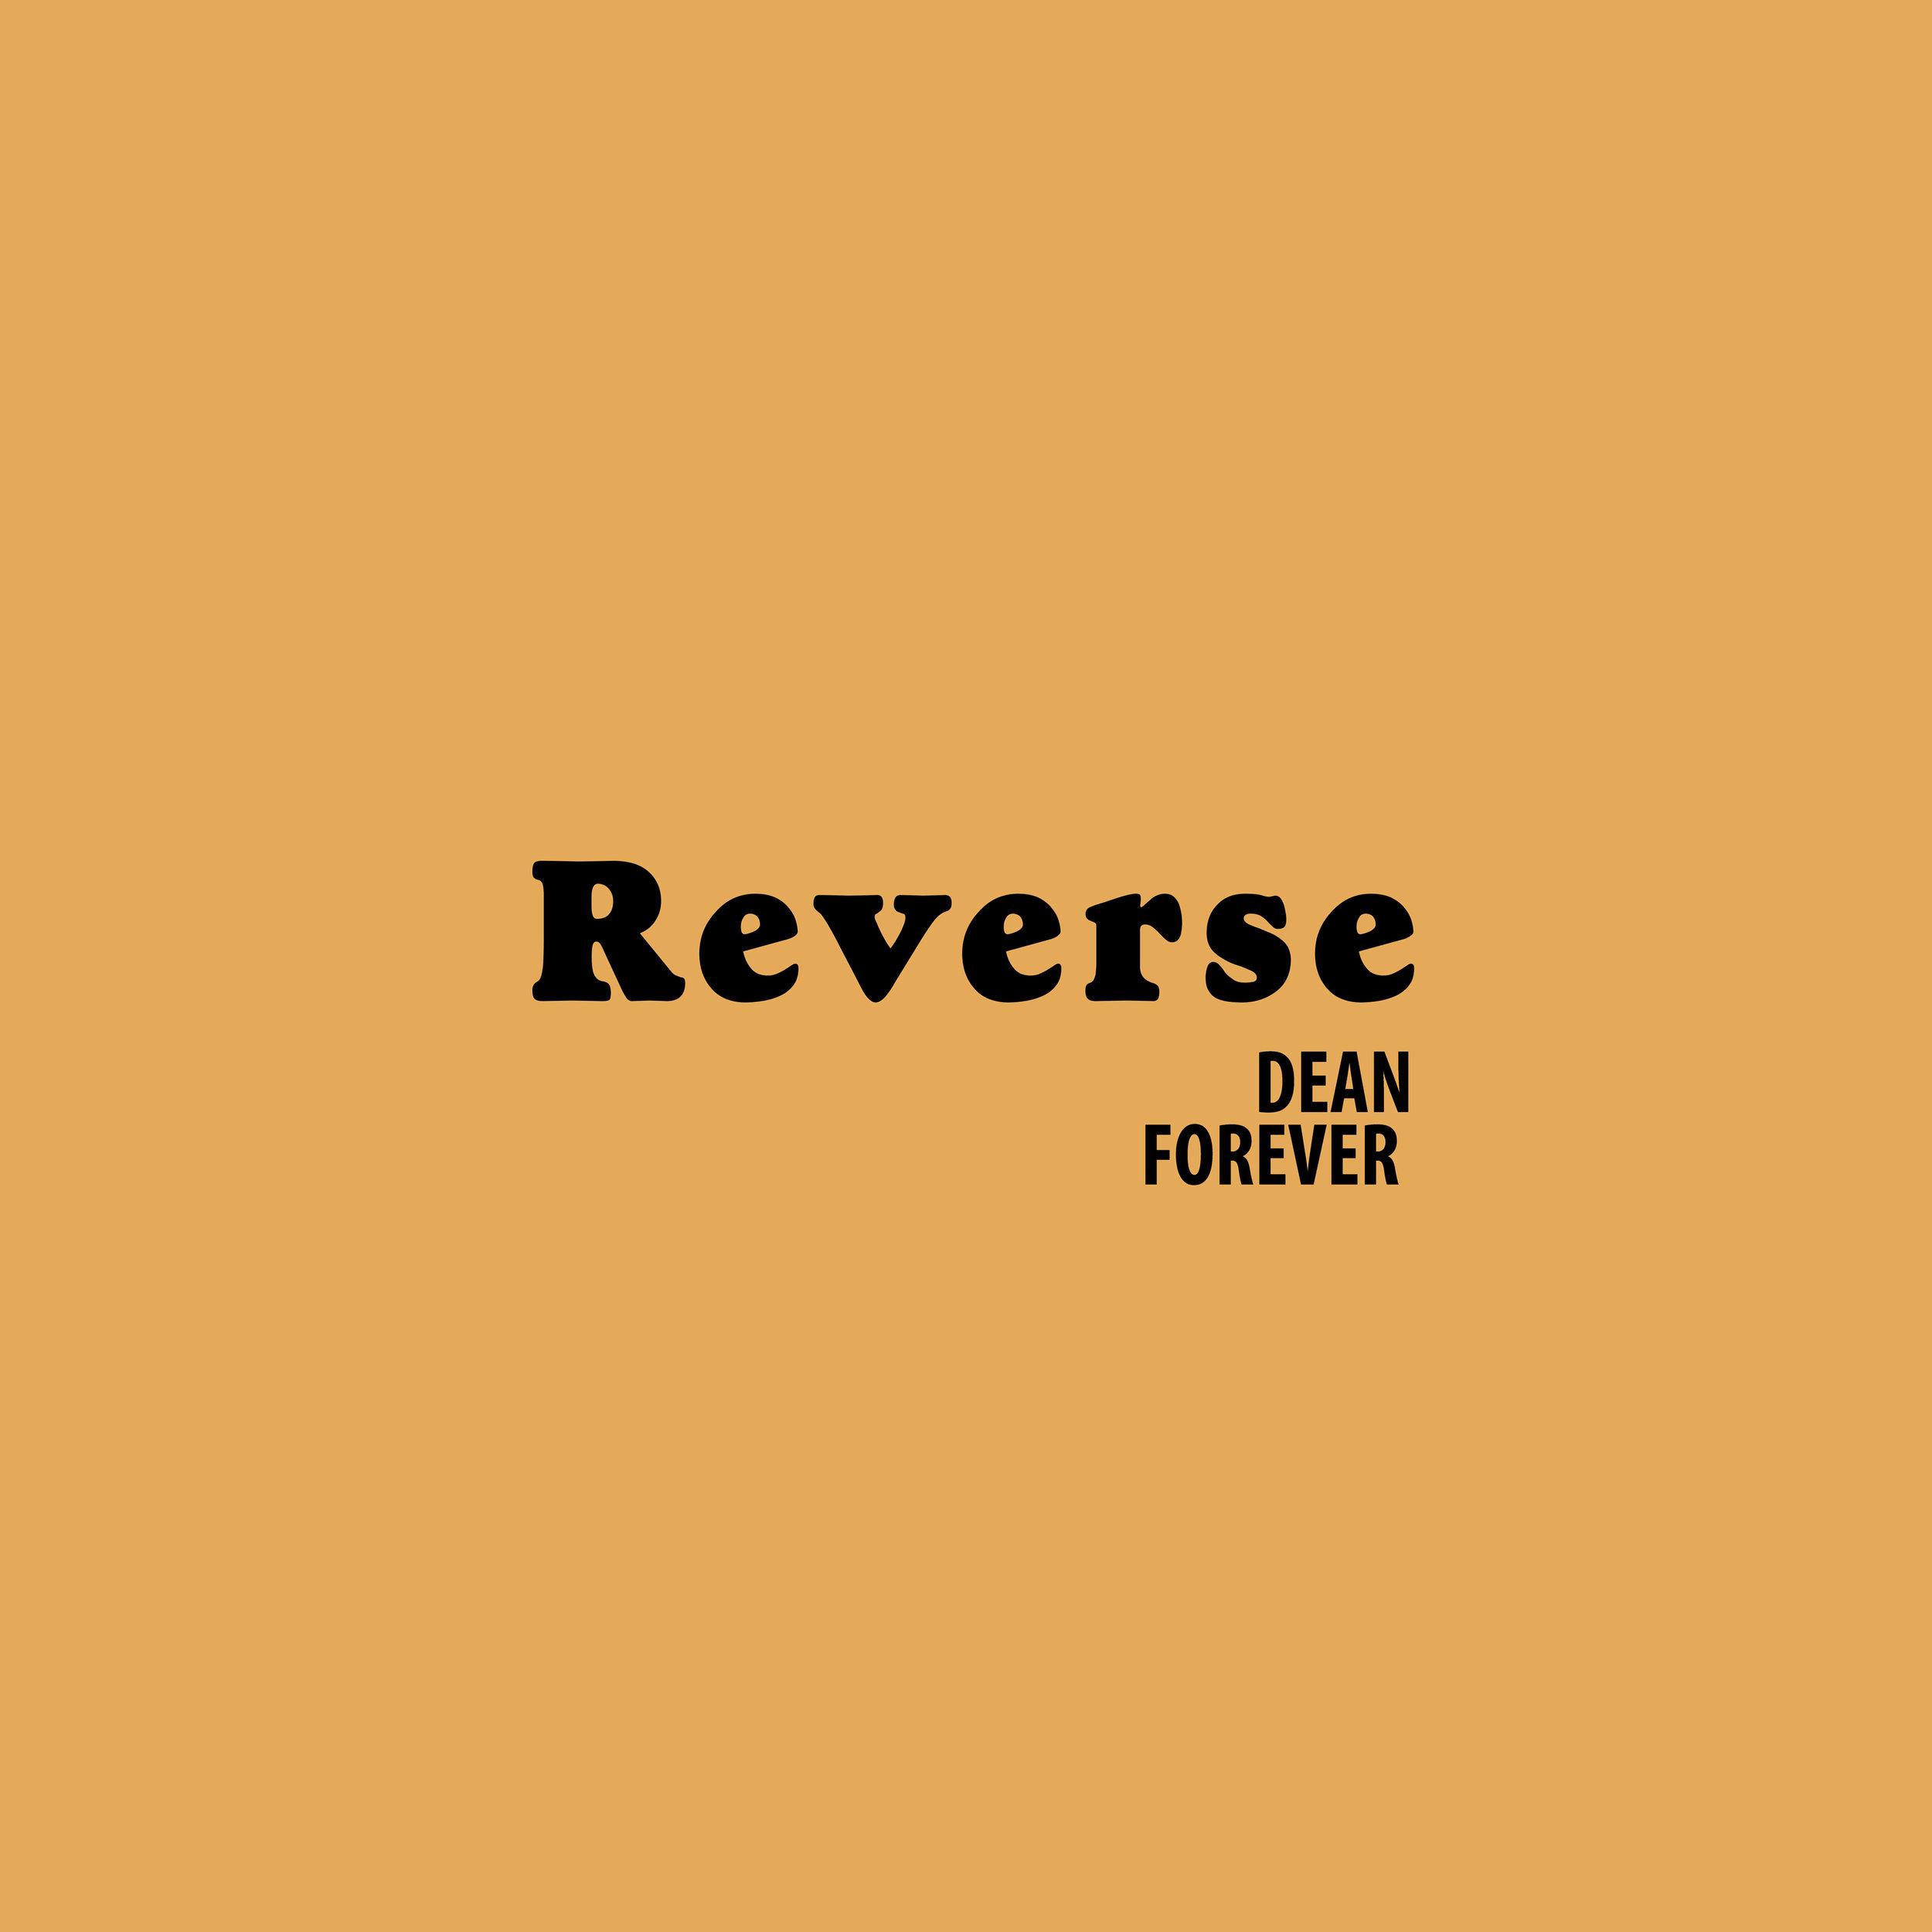 df-reveverse-branding.jpg